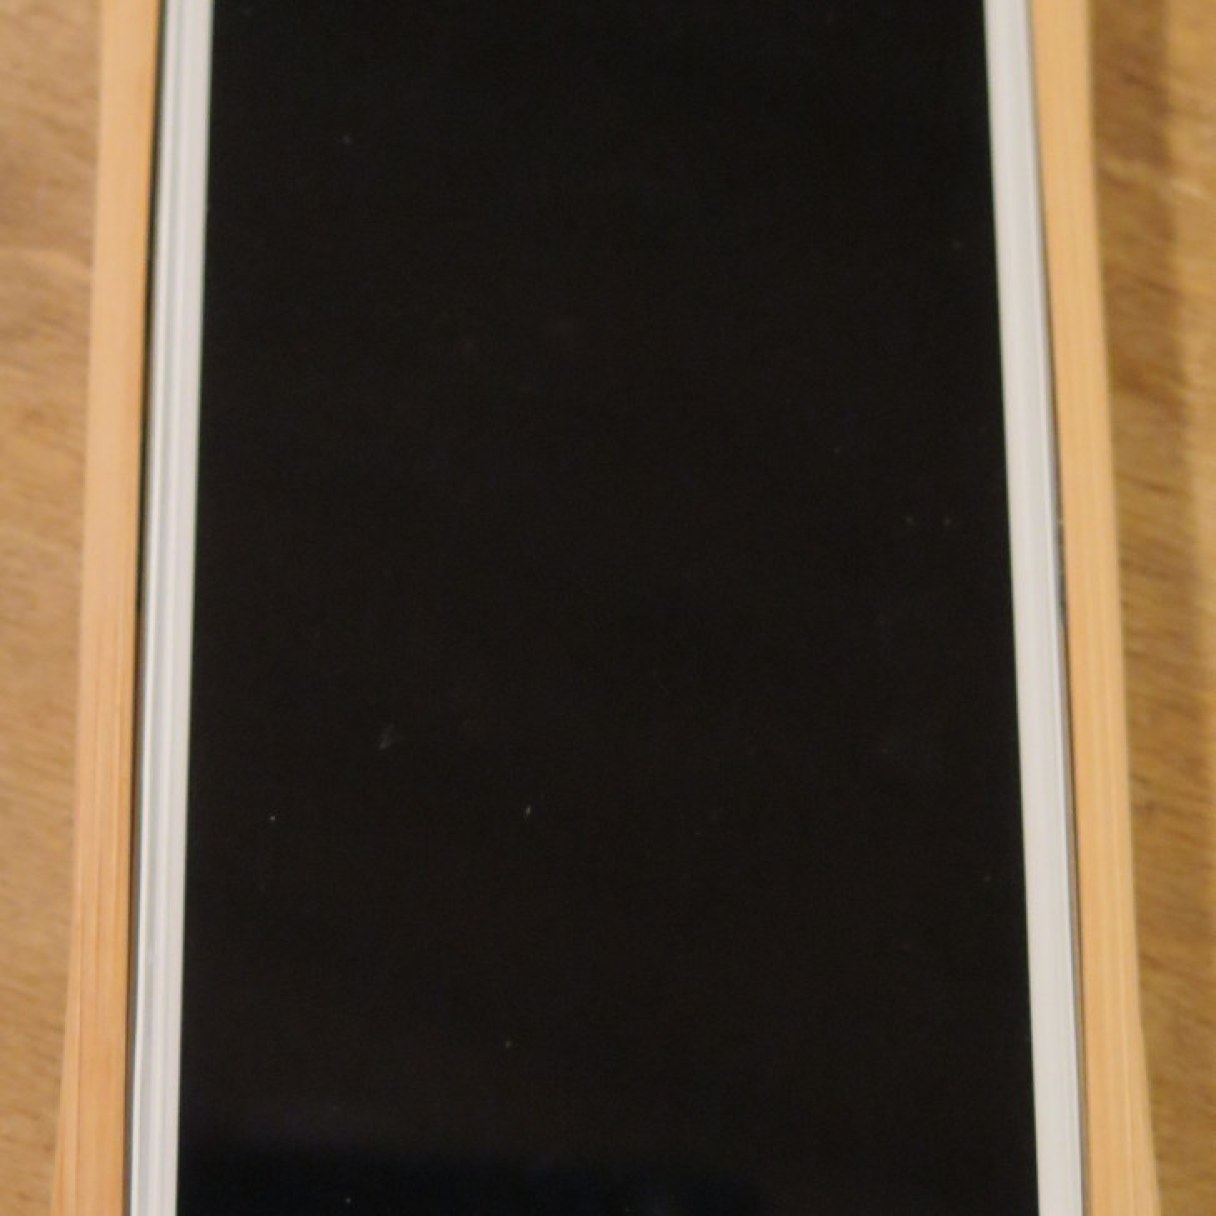 geardiary-element-case-ronin-iphone-016